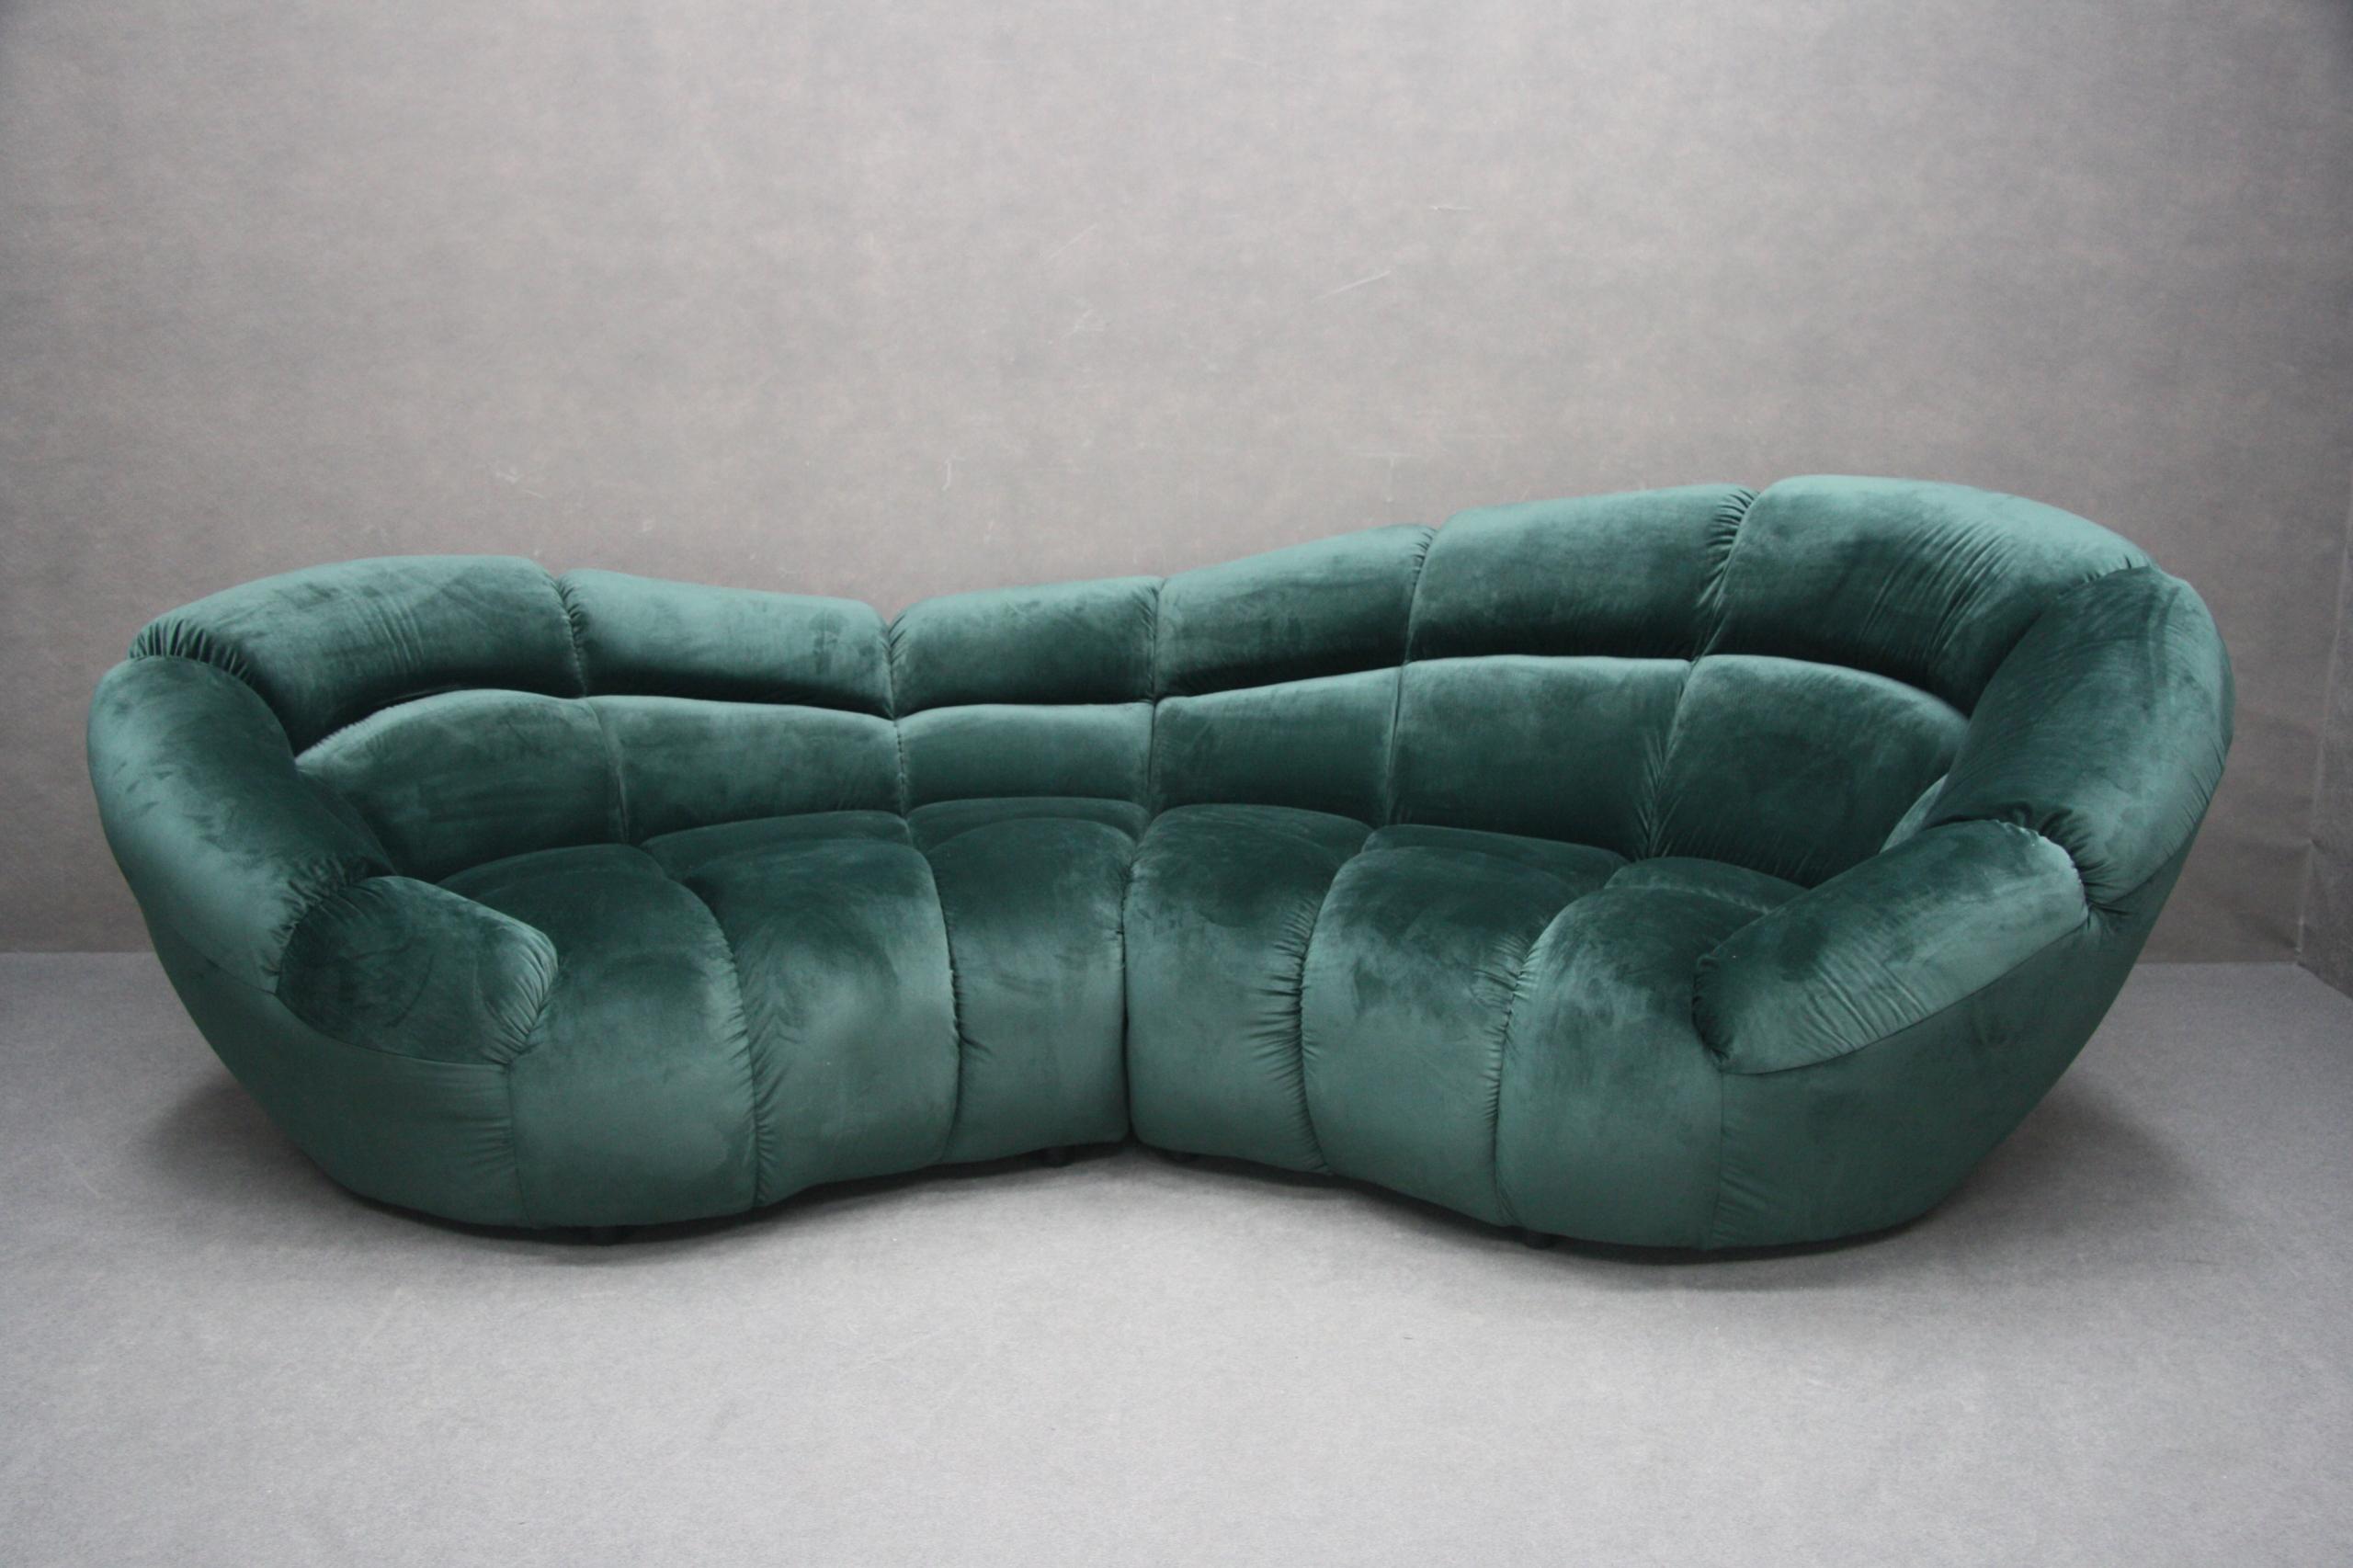 Pohovka-gauč rozkladací Gauč-Zelený Ovál RETRO Fľaša zelená